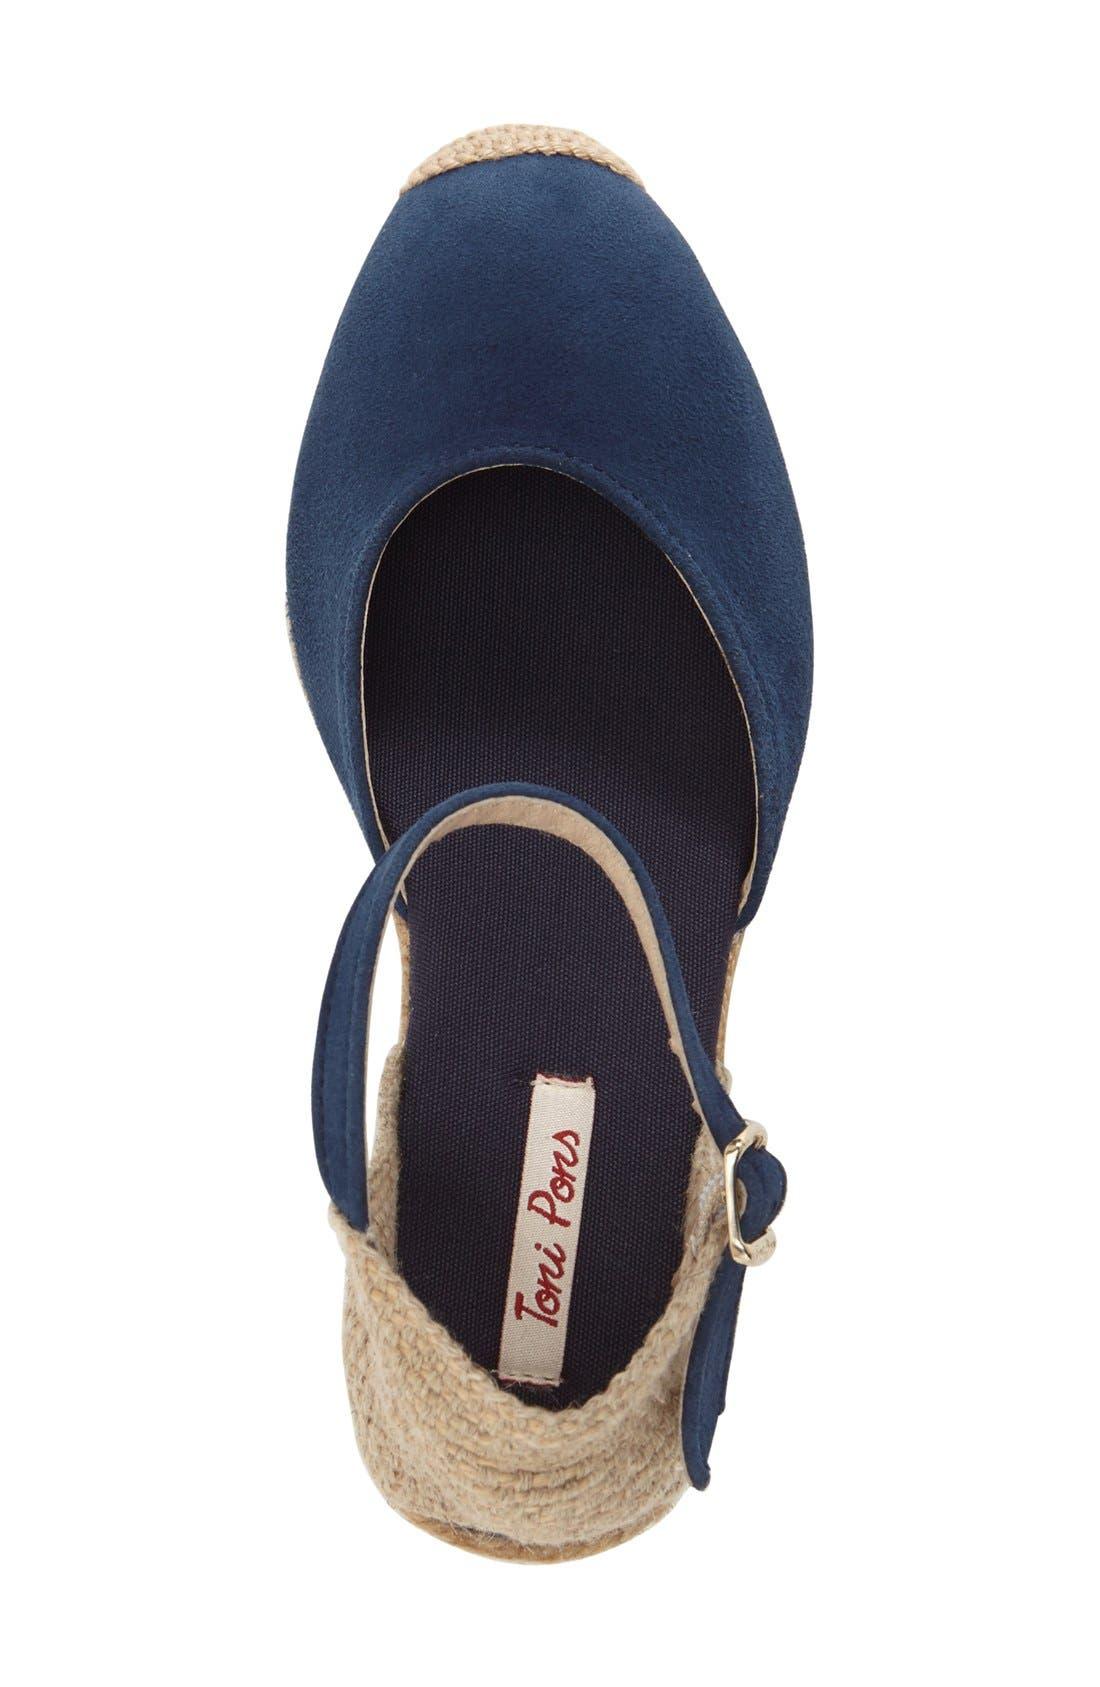 Alternate Image 3  - Toni Pons 'Lloret-5' Espadrille Wedge Sandal (Women)